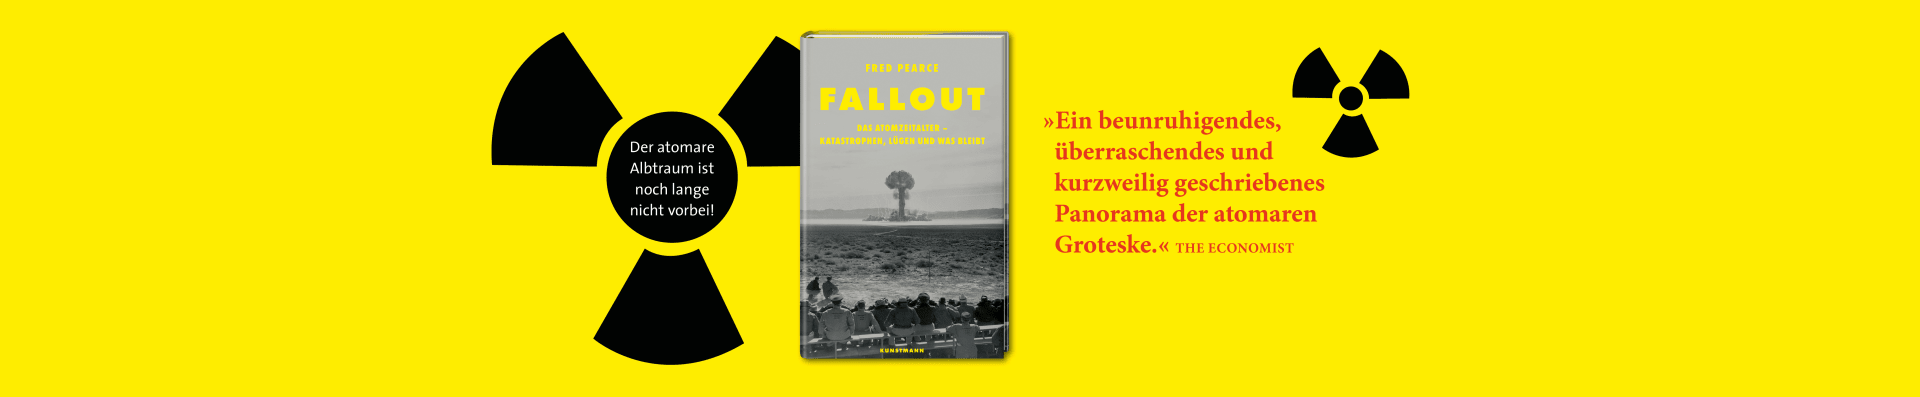 Fred Pearce – Fallout